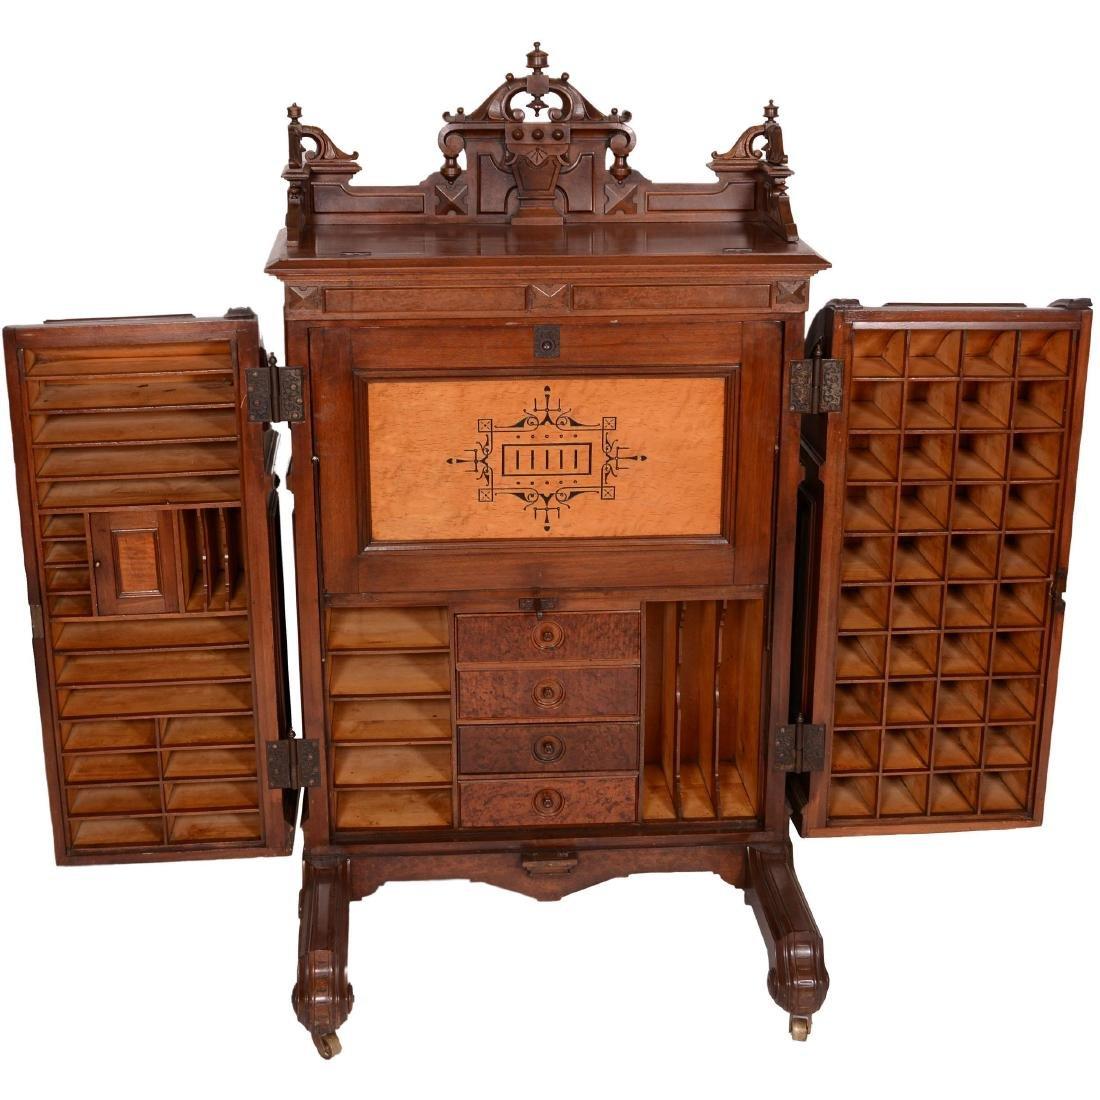 Fantastic Wooton Standard Grade Patent Desk